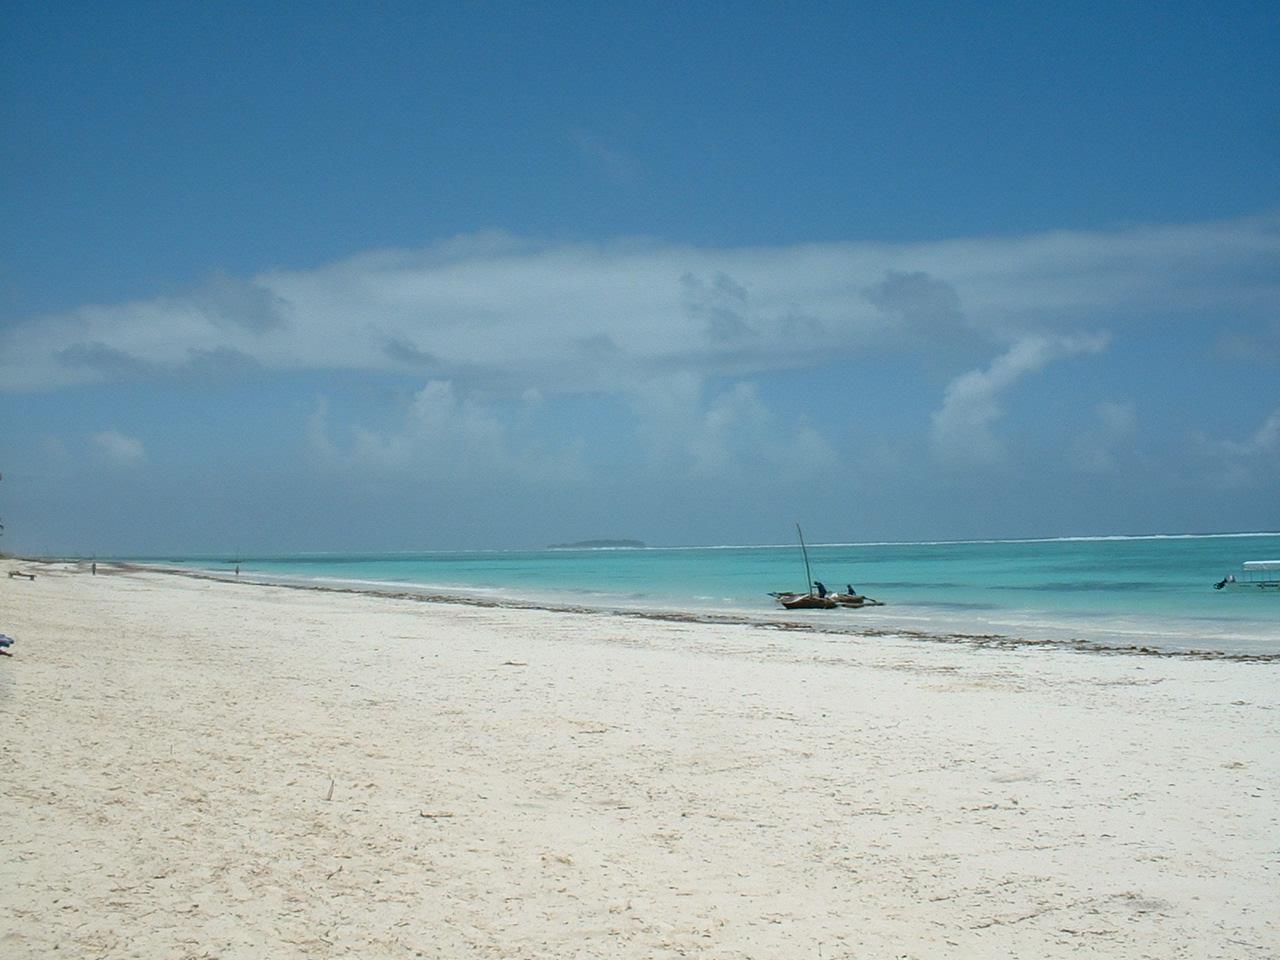 http://1.bp.blogspot.com/_R8c3bIPv5TE/TIExoonLaYI/AAAAAAAAAy4/SW19RSYprMQ/s1600/ZanzibarBeach.jpg